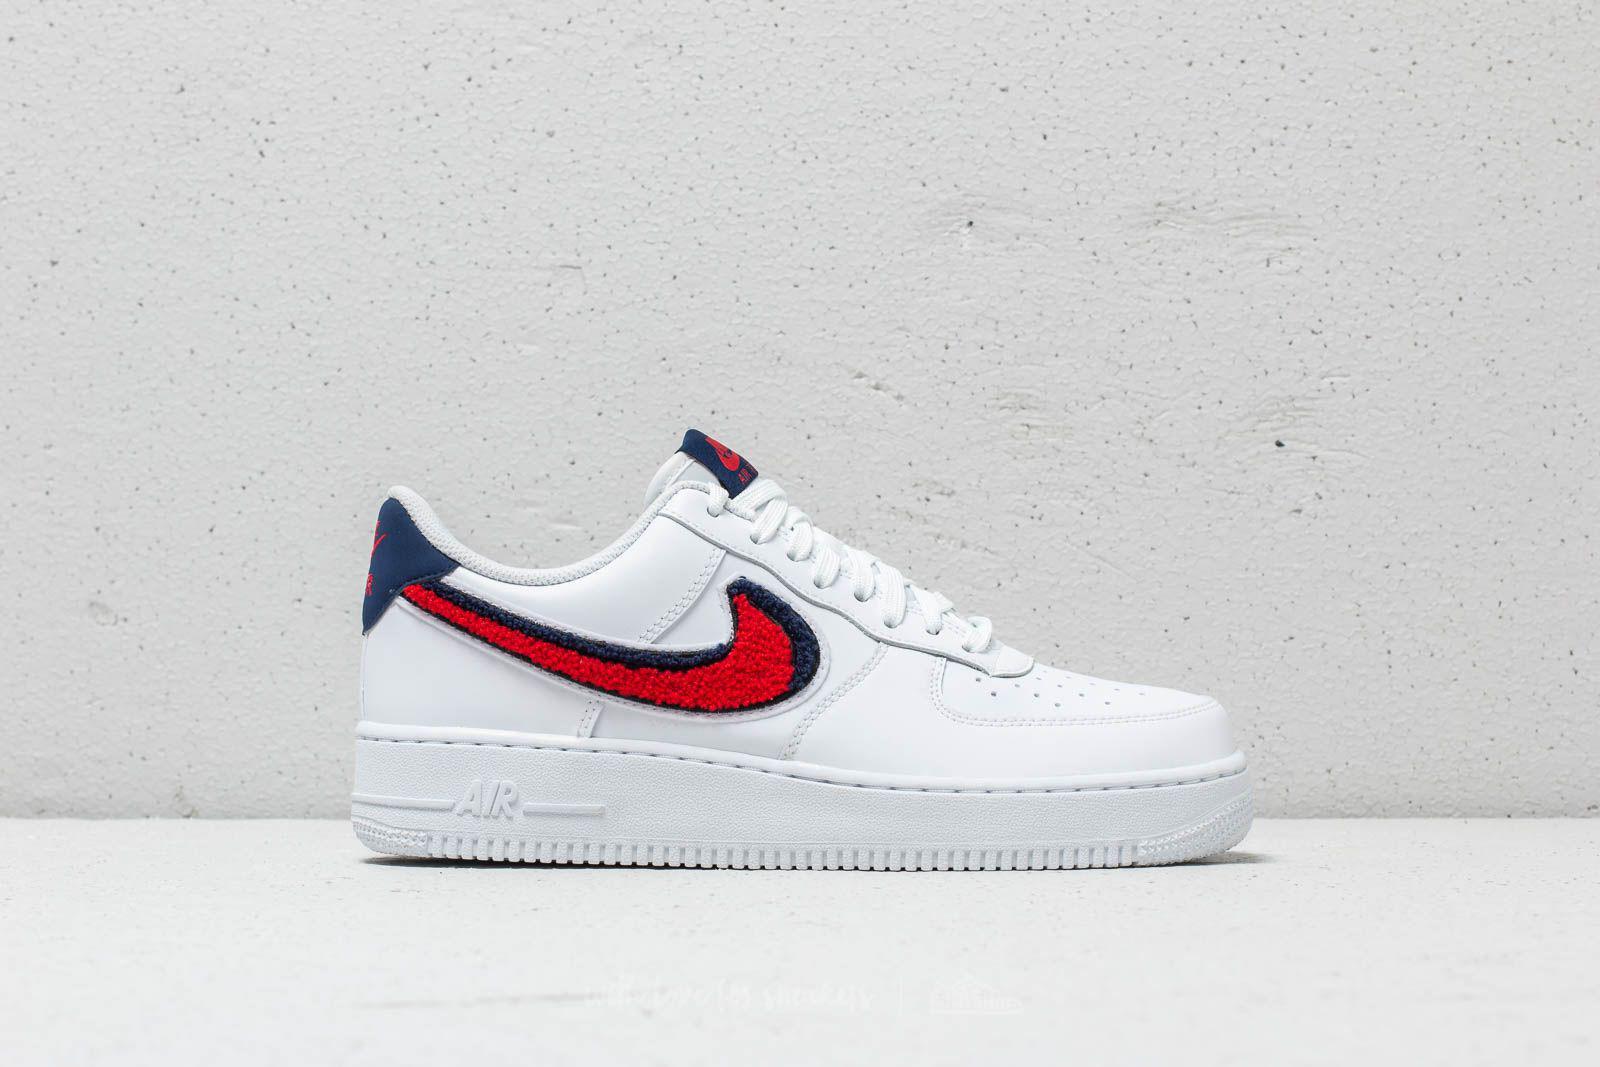 ... good service ... genuine shoes 54526 0da31 Lyst - Nike Air Force 1 ́07  ... b7957289dbc1